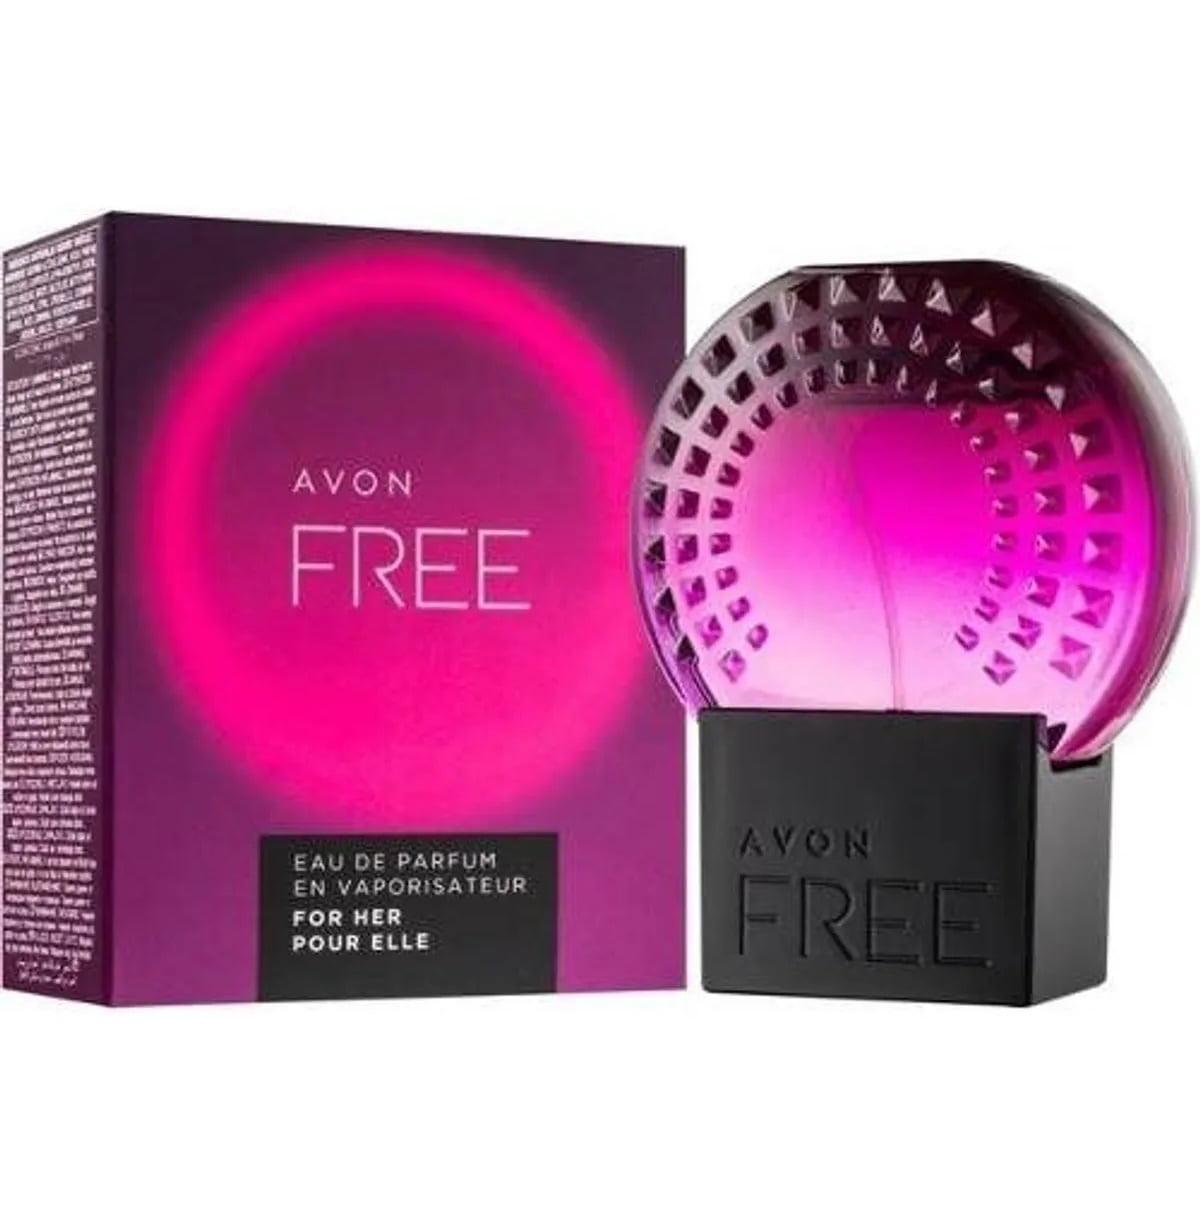 Avon FREE Deo Parfum For Her 50 ml